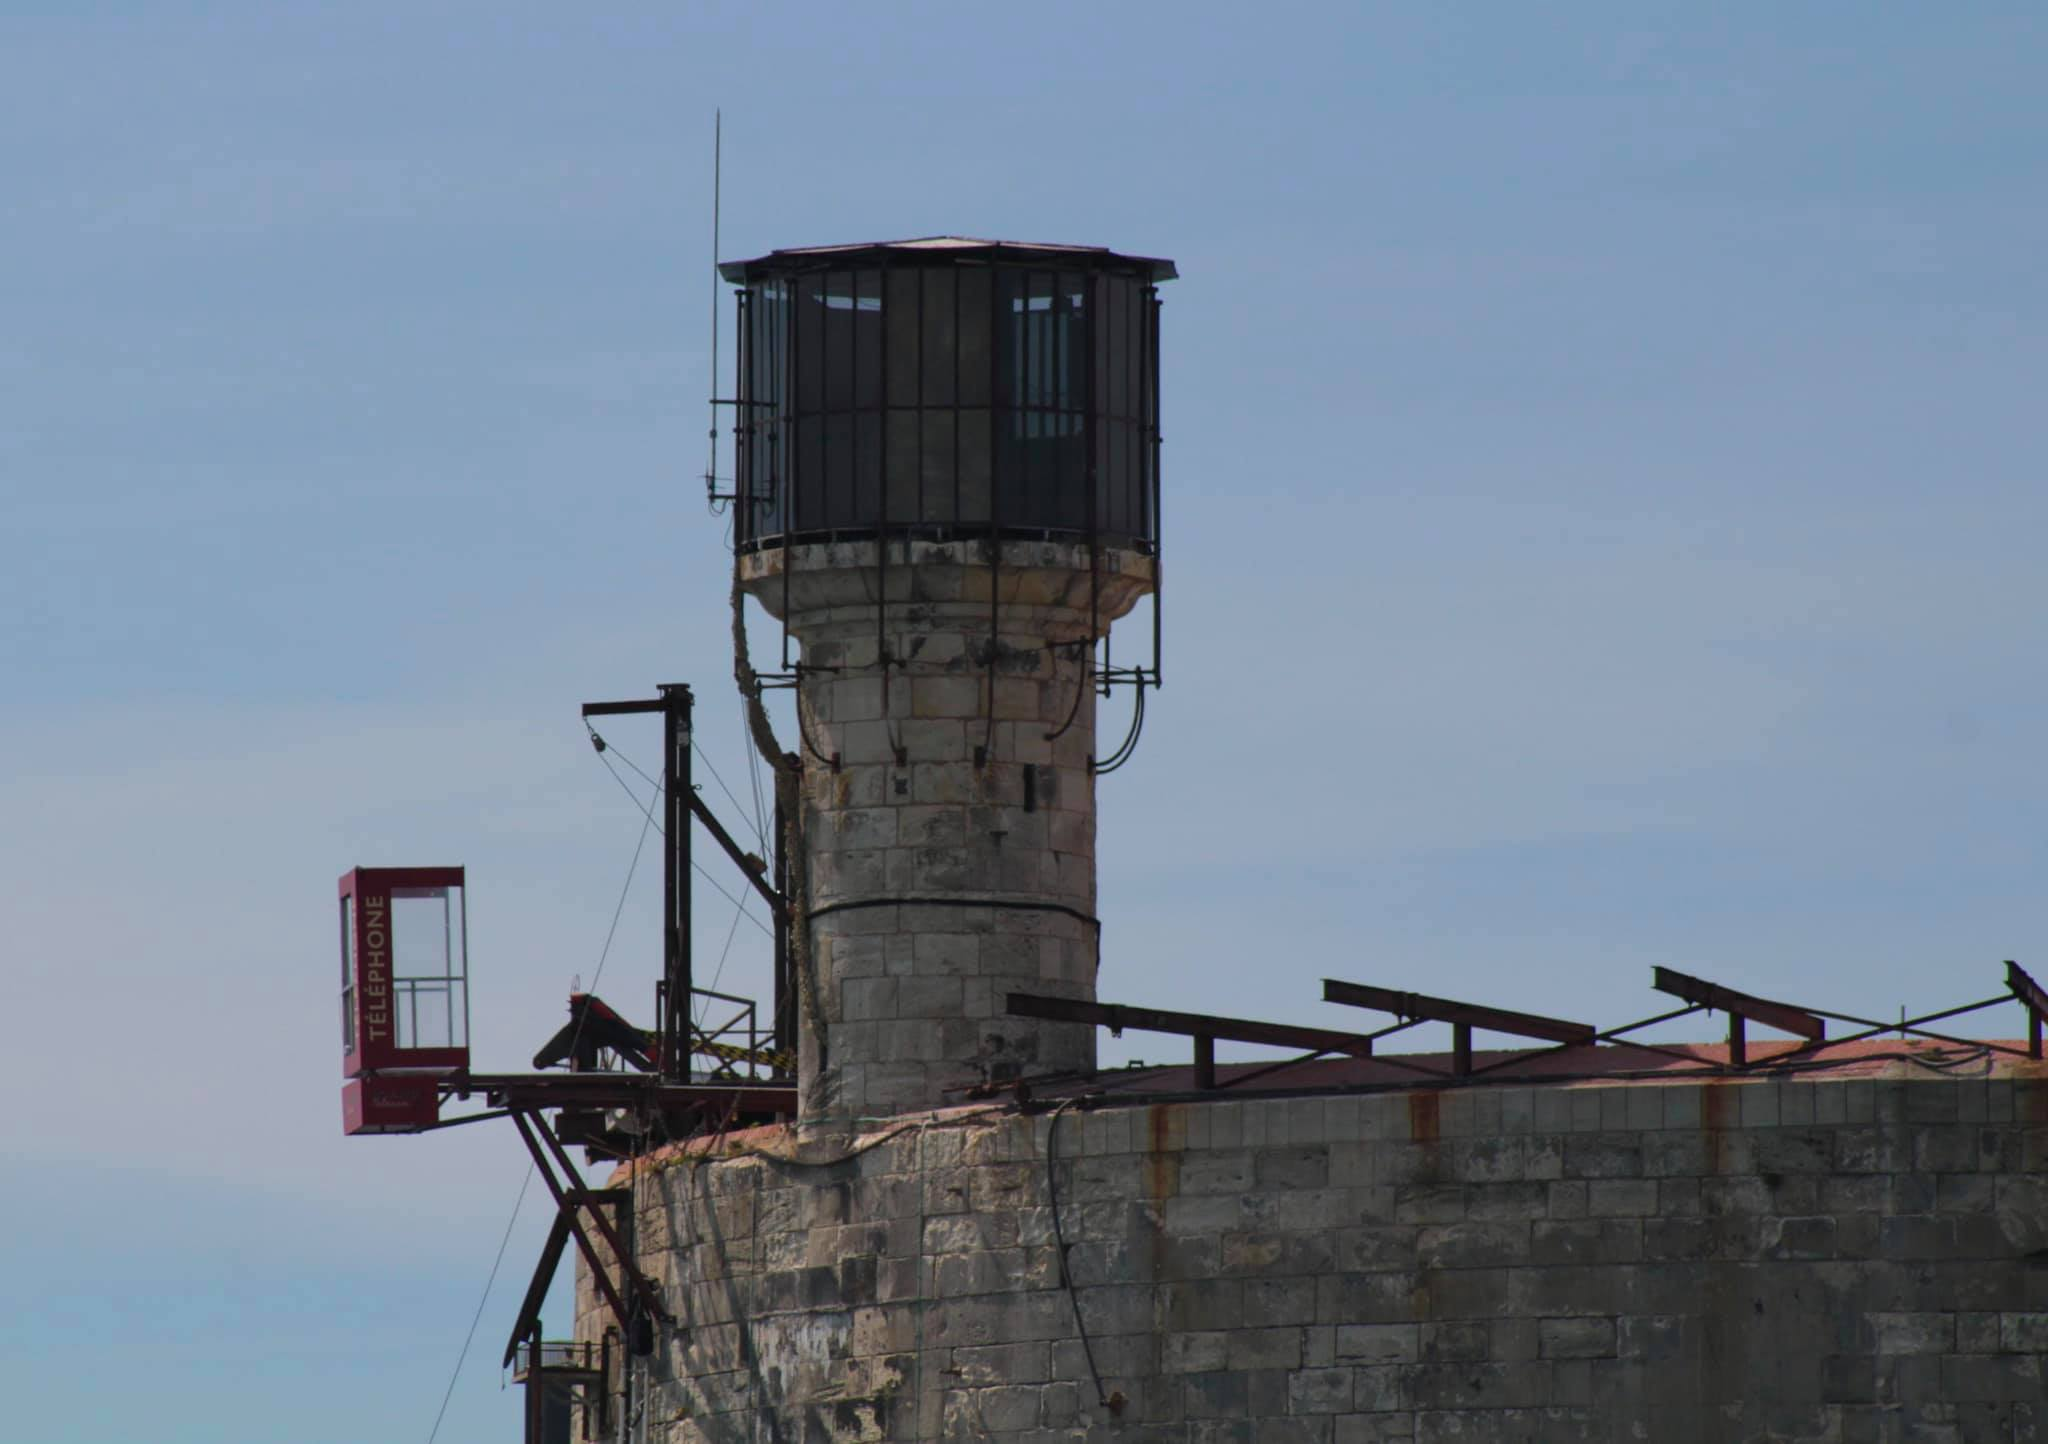 Photos des tournages Fort Boyard 2021 (production + candidats) - Page 6 18332110